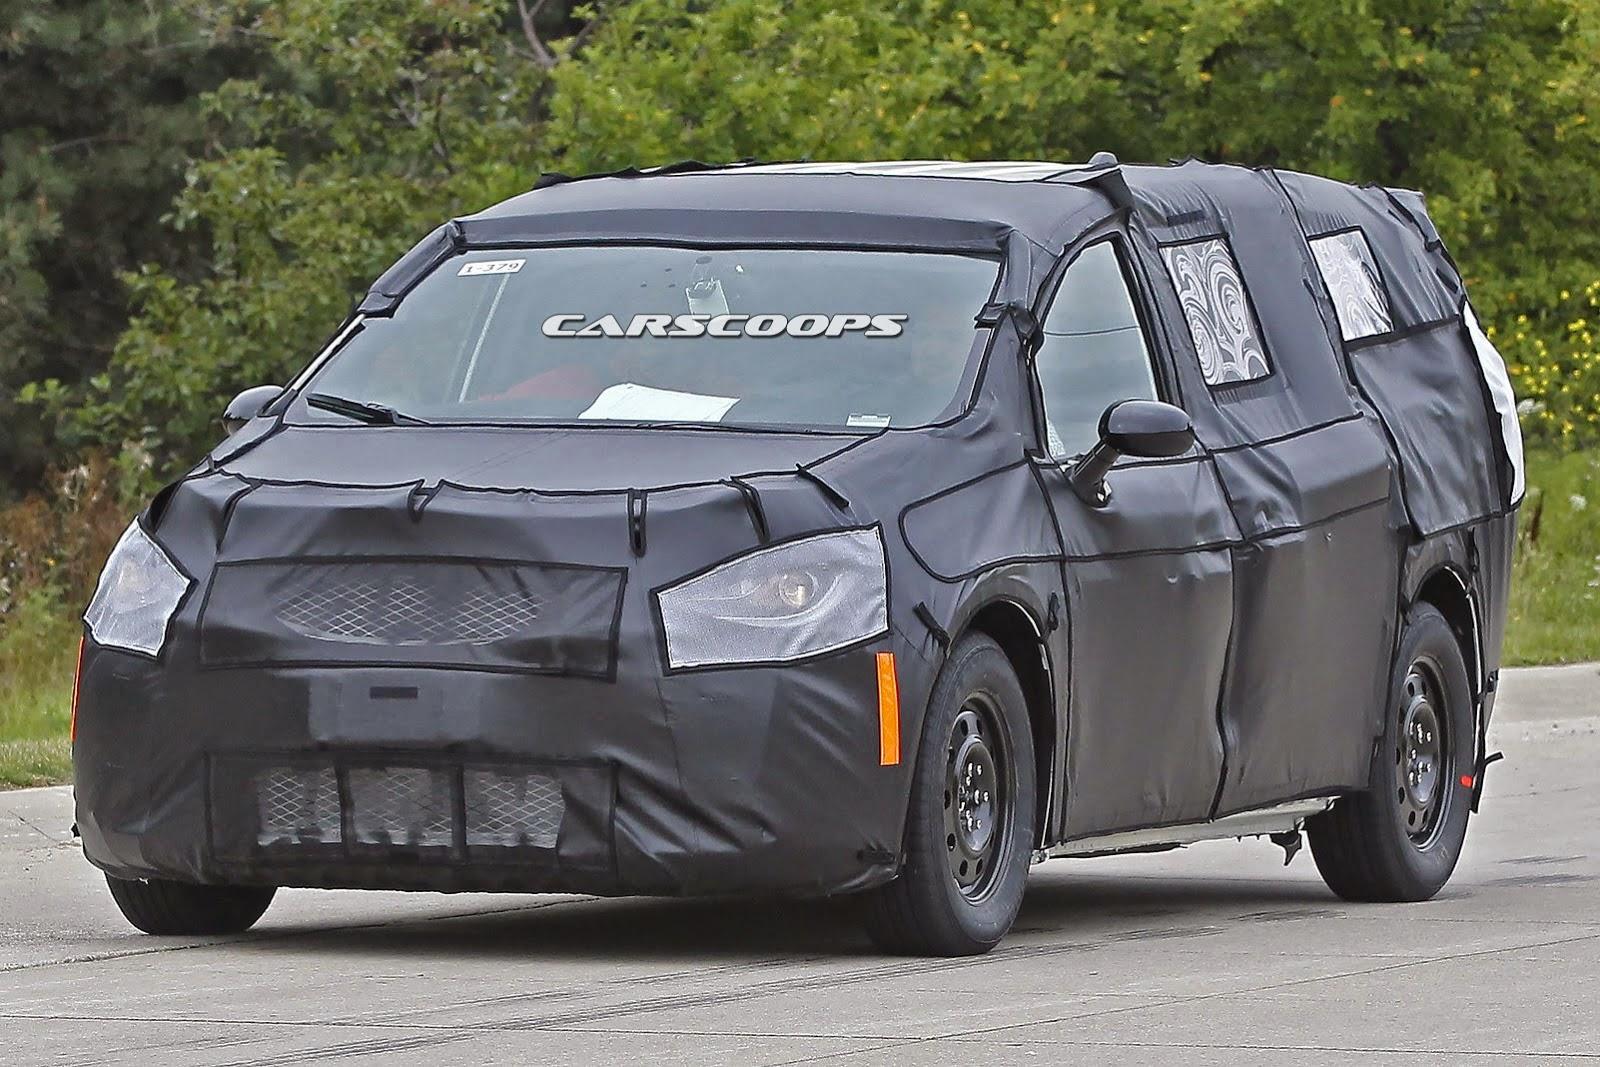 chrysler confirms new minivan for 2016 detroit auto show. Black Bedroom Furniture Sets. Home Design Ideas